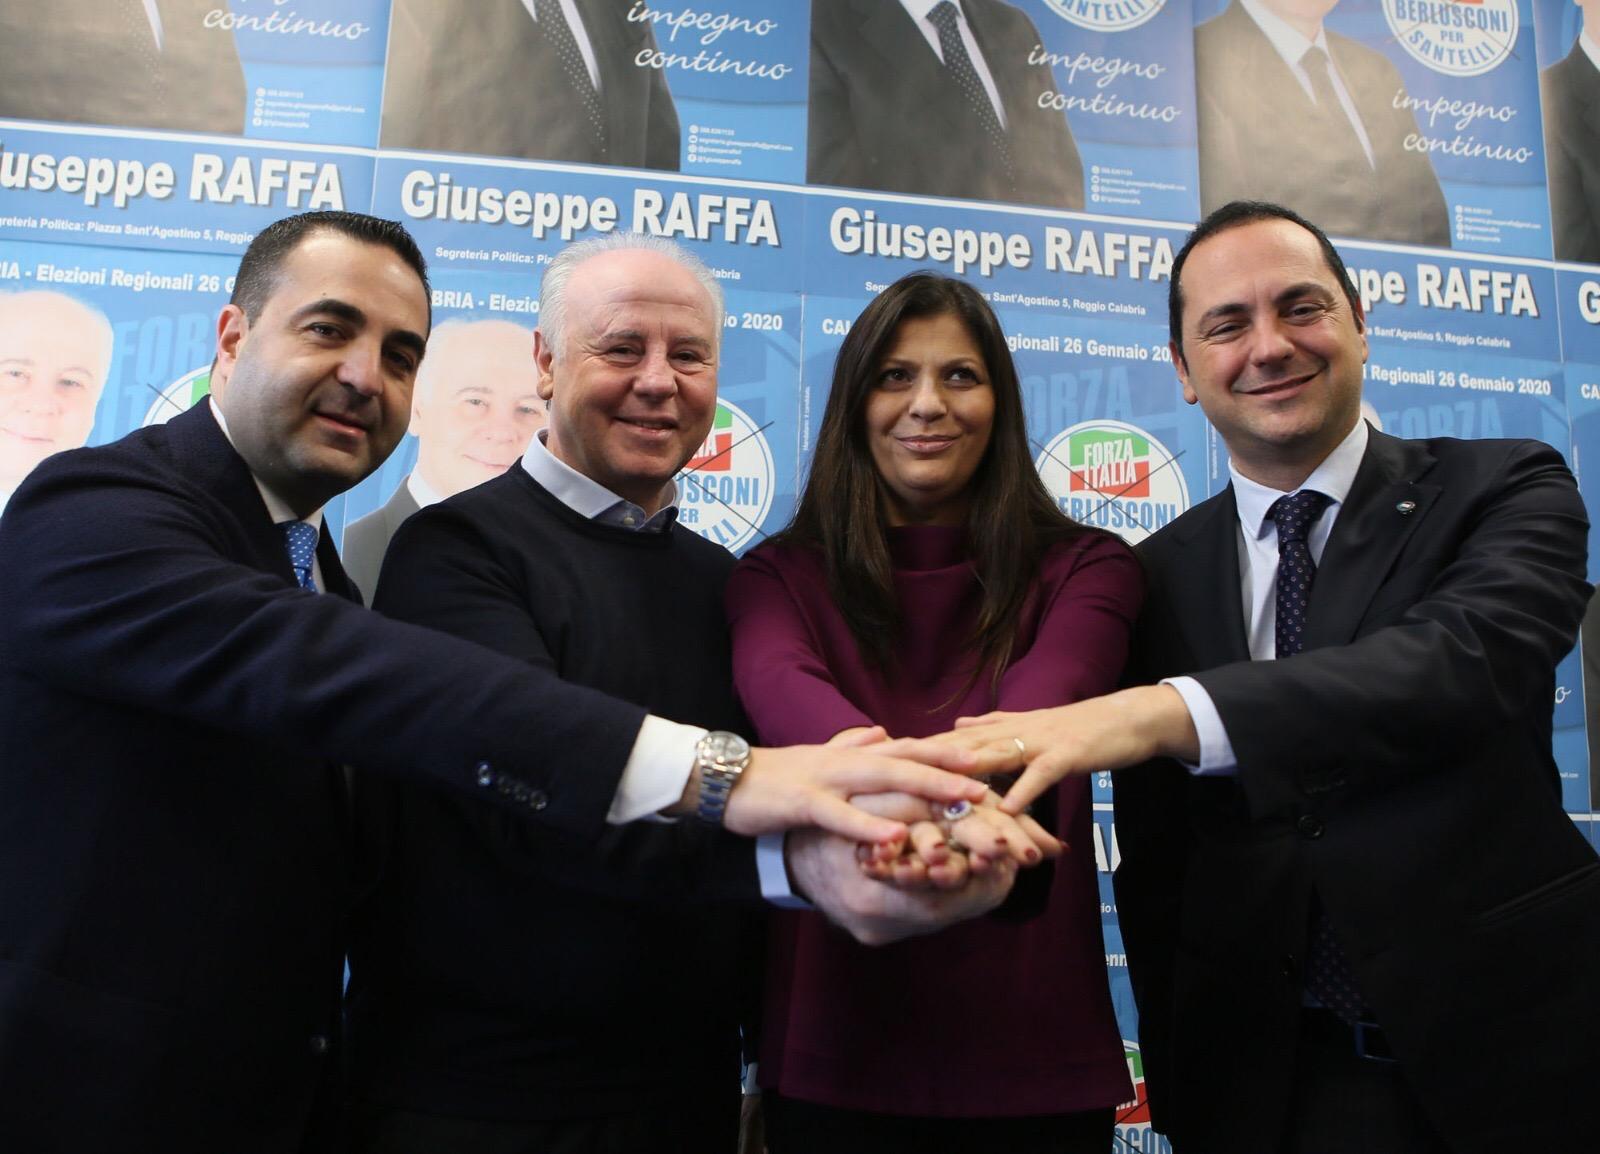 Peppe Raffa